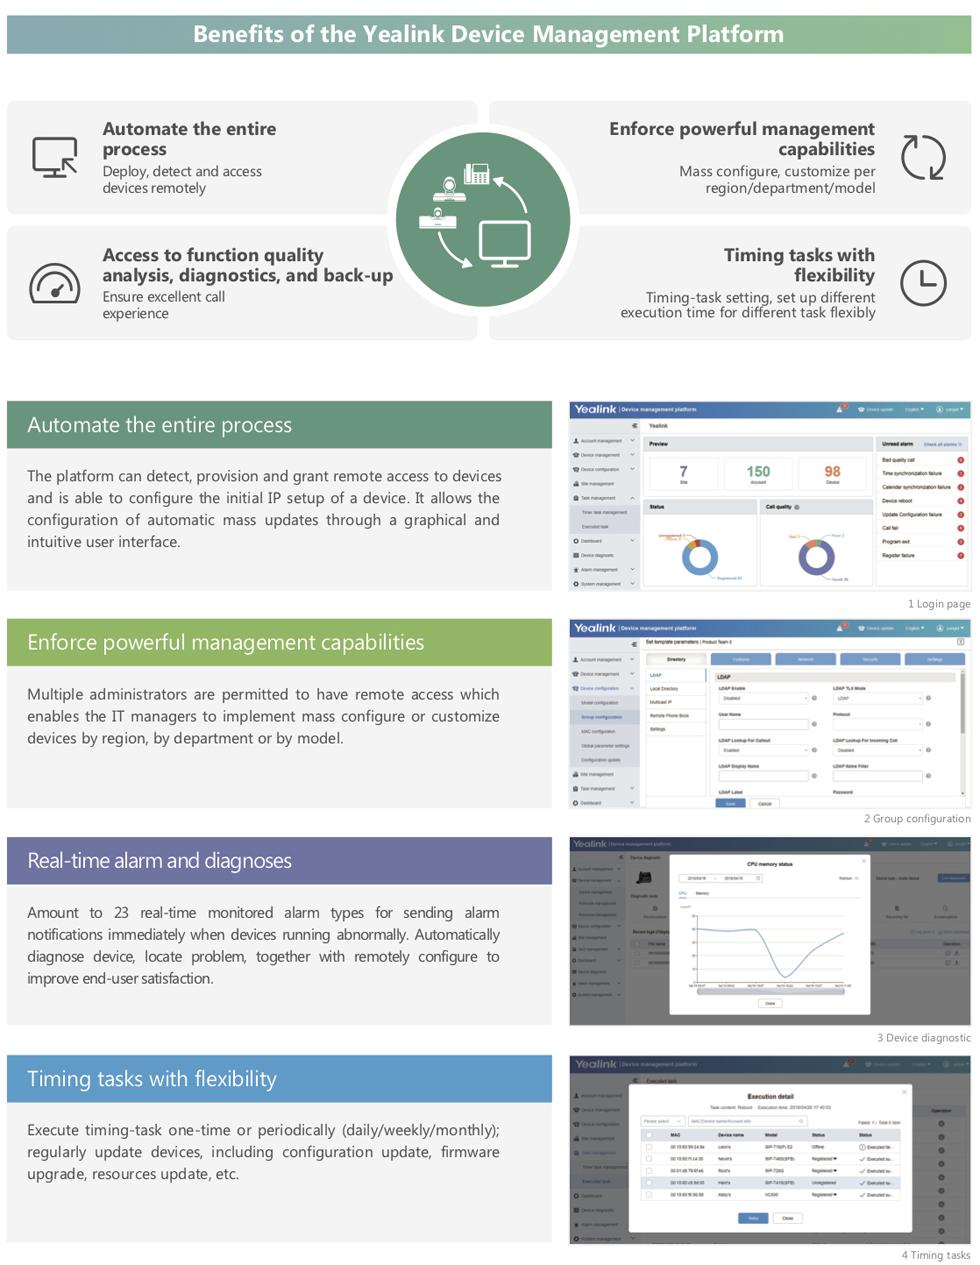 Benefits of the Yealink Device Management Platform